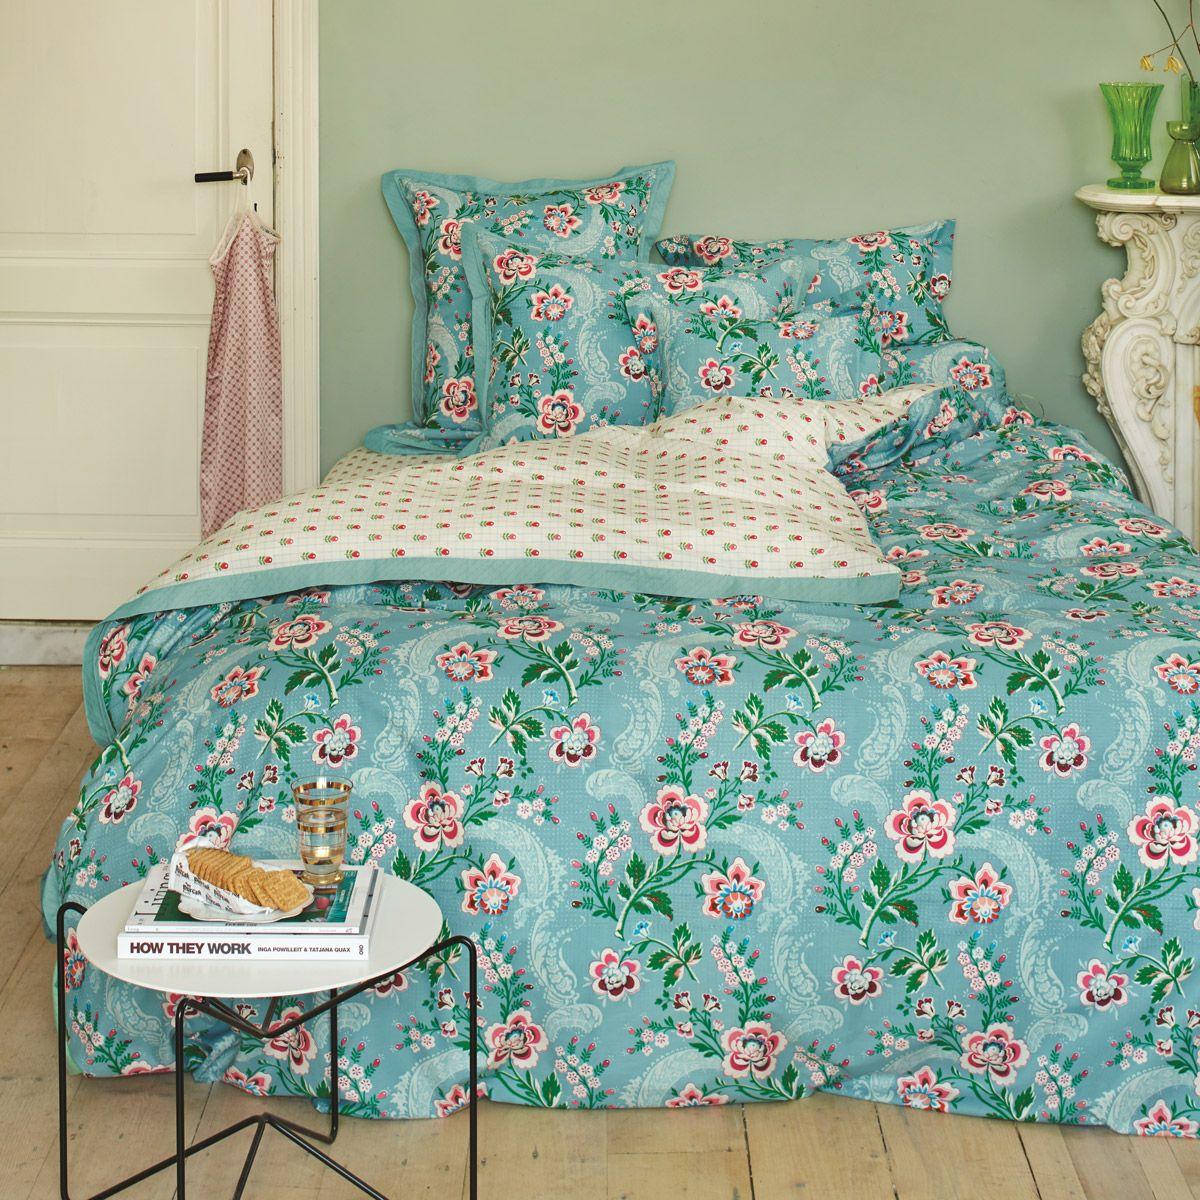 pip studio bettw sche le bois fleuri blau betten mit sch ner bettw sche bettw sche bett. Black Bedroom Furniture Sets. Home Design Ideas